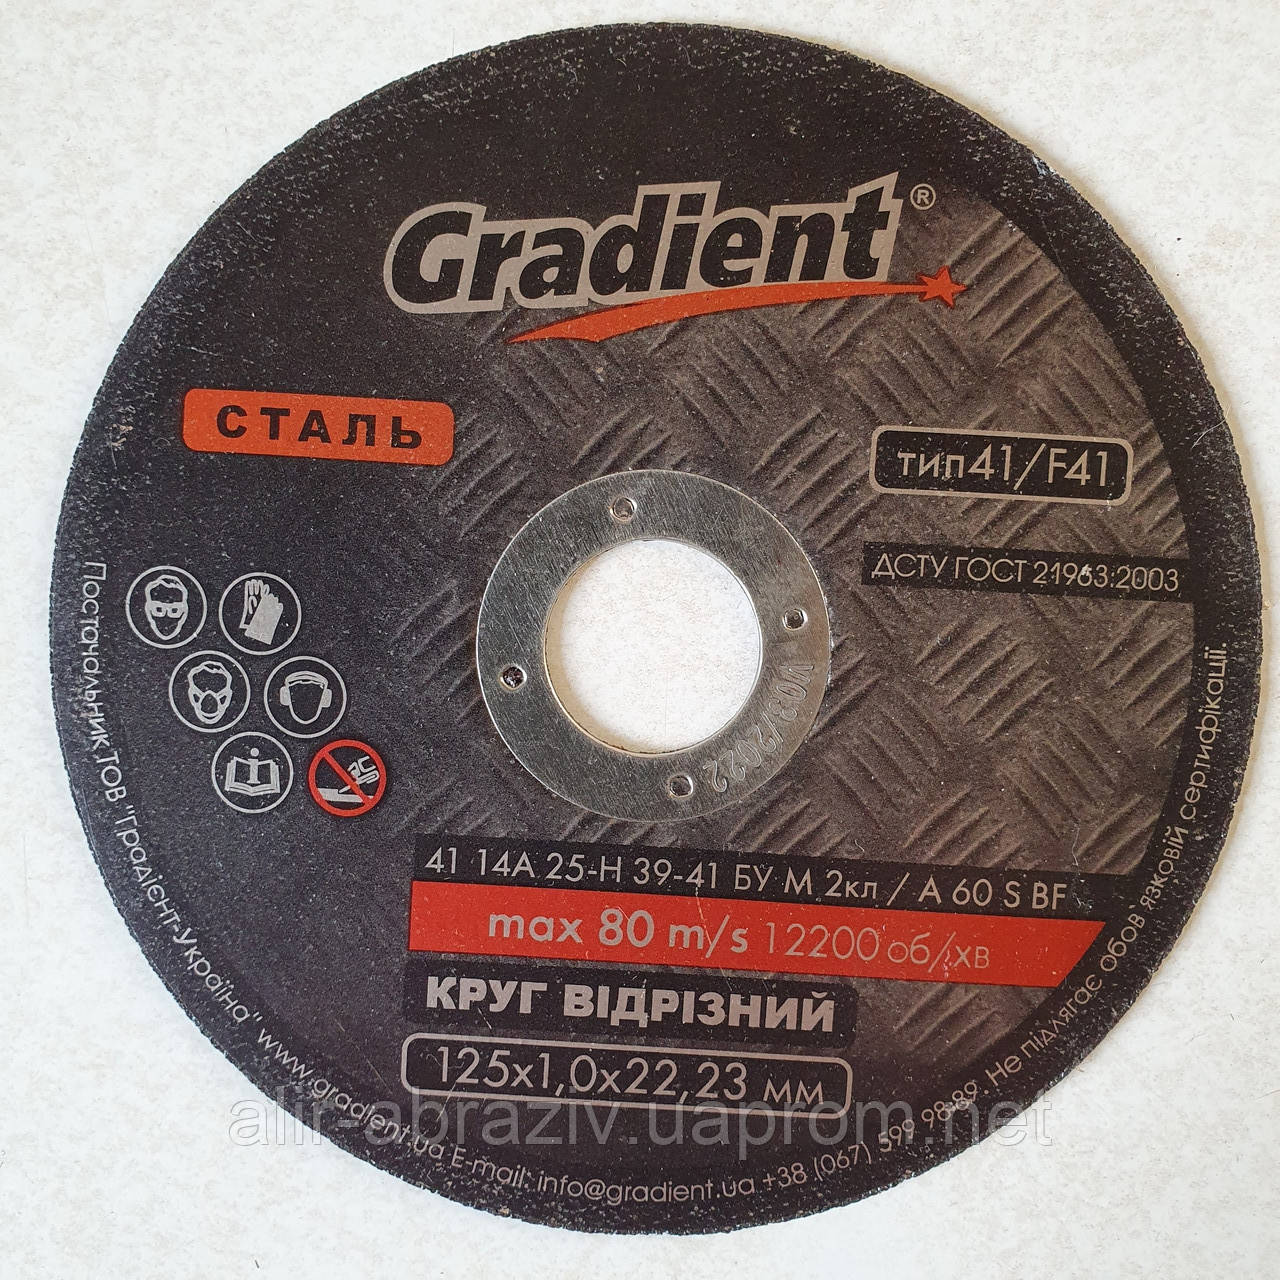 Круг отрезной 125-1-22 Gradient